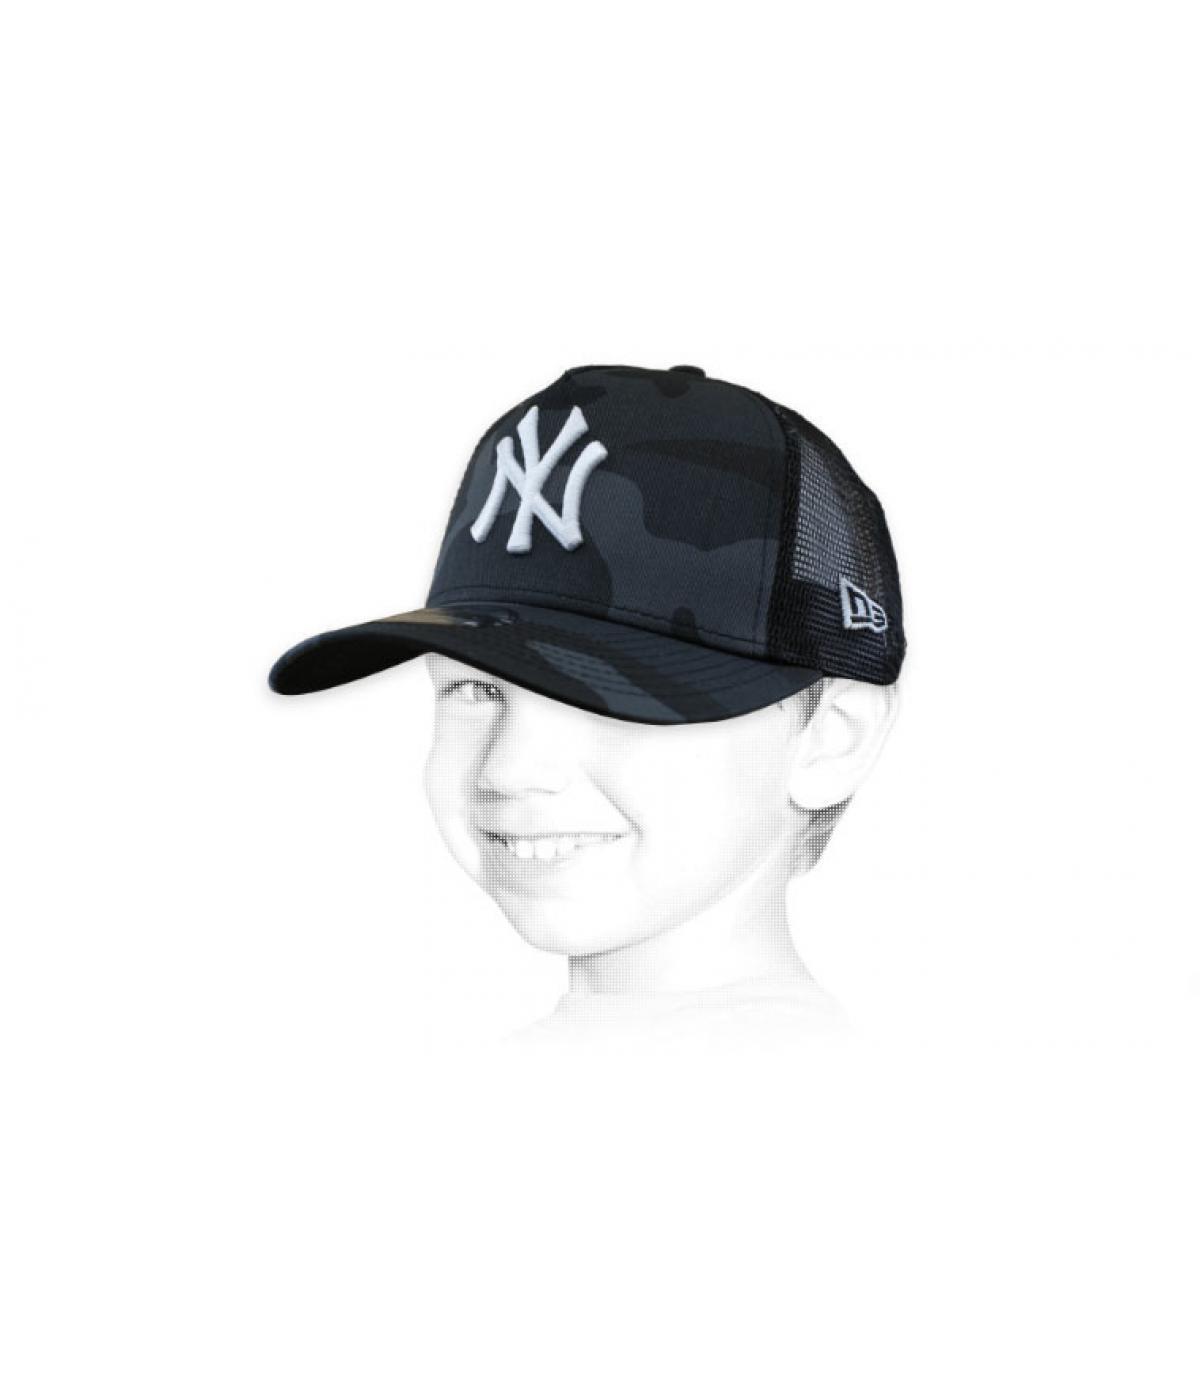 camionista bambino NY grigio mimetico